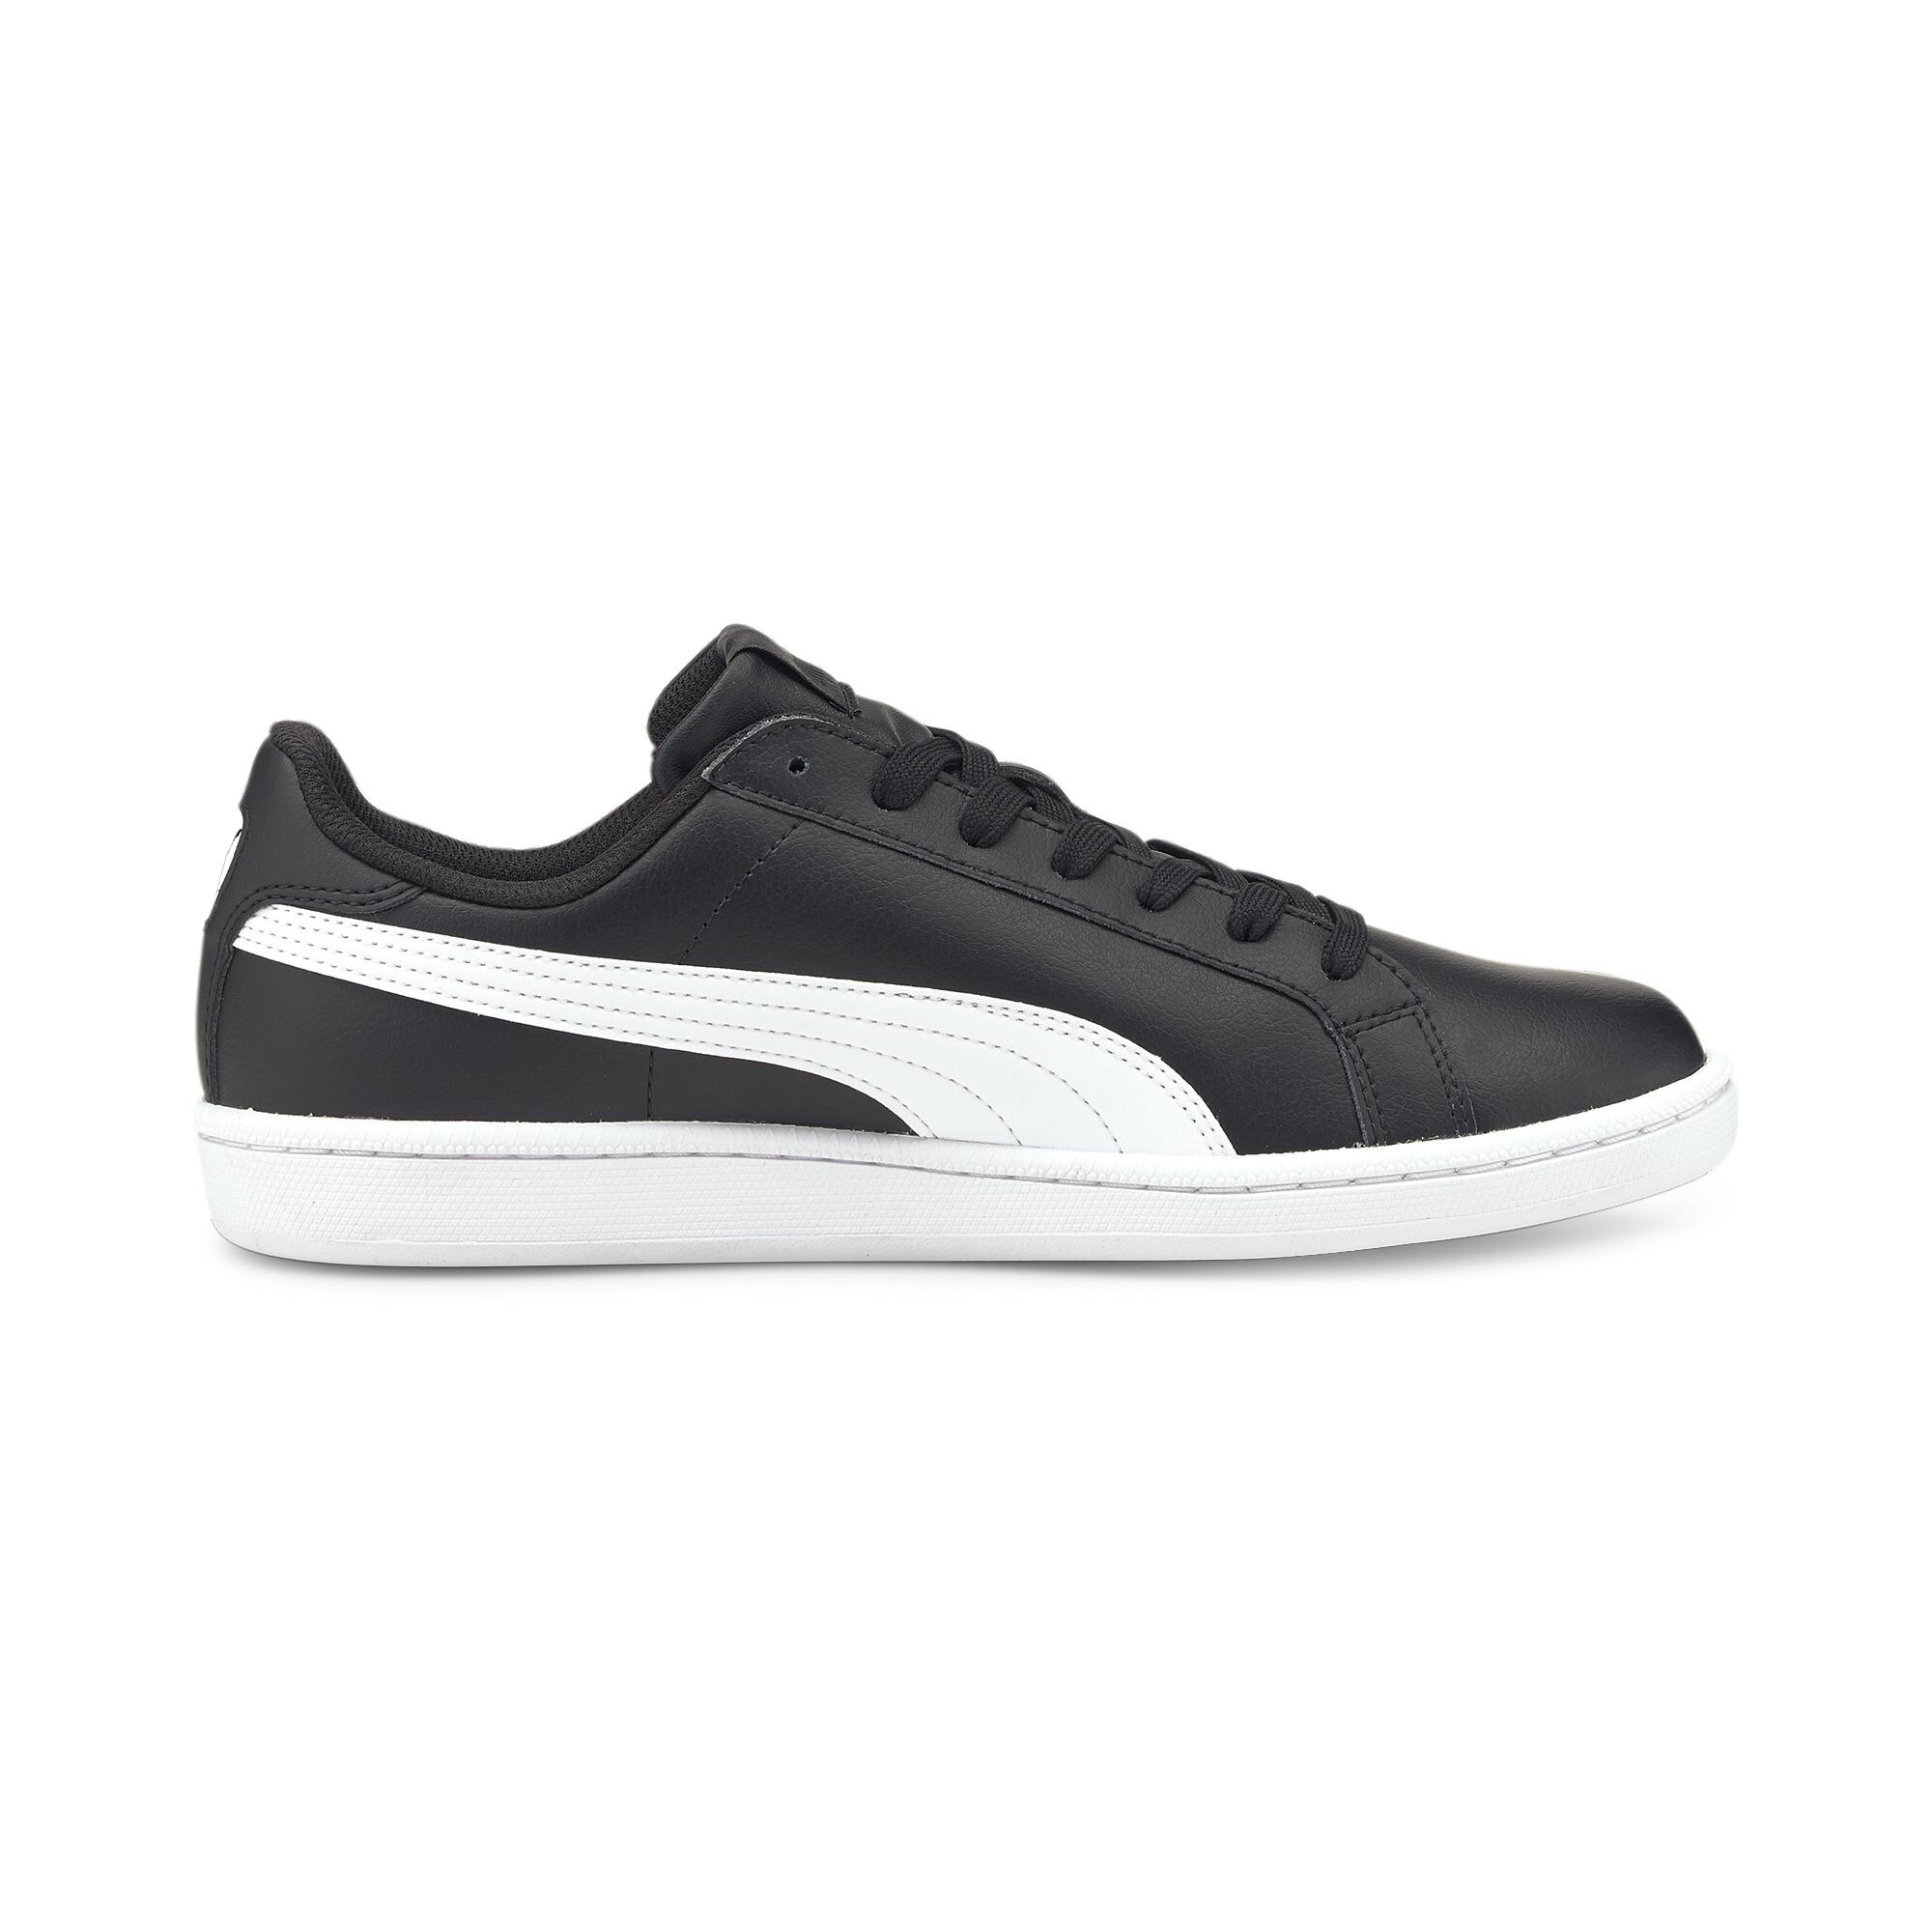 PUMA-Smash-Trainers-Schuhe-Sneakers-Sport-Classics-Unisex-Neu Indexbild 26